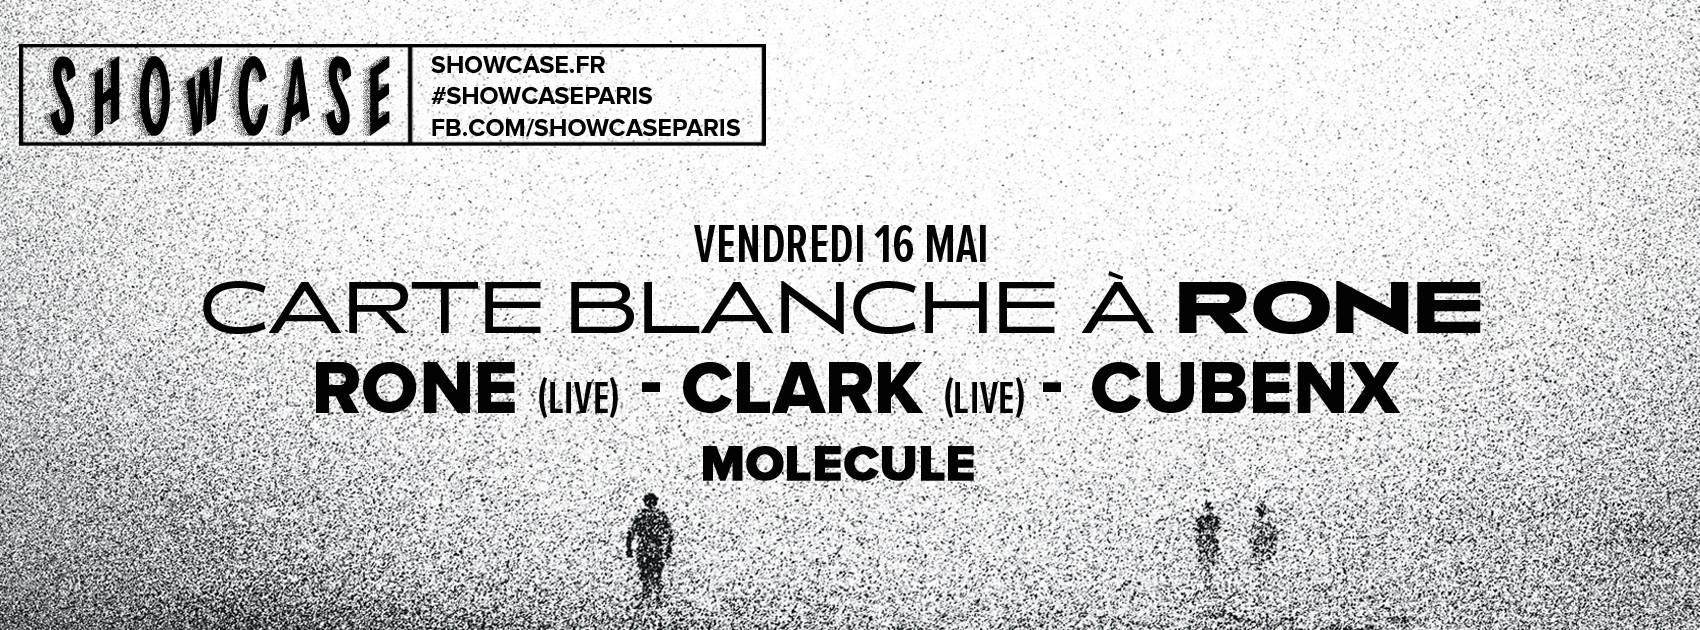 Rone - Clark - Cubenx au Showcase